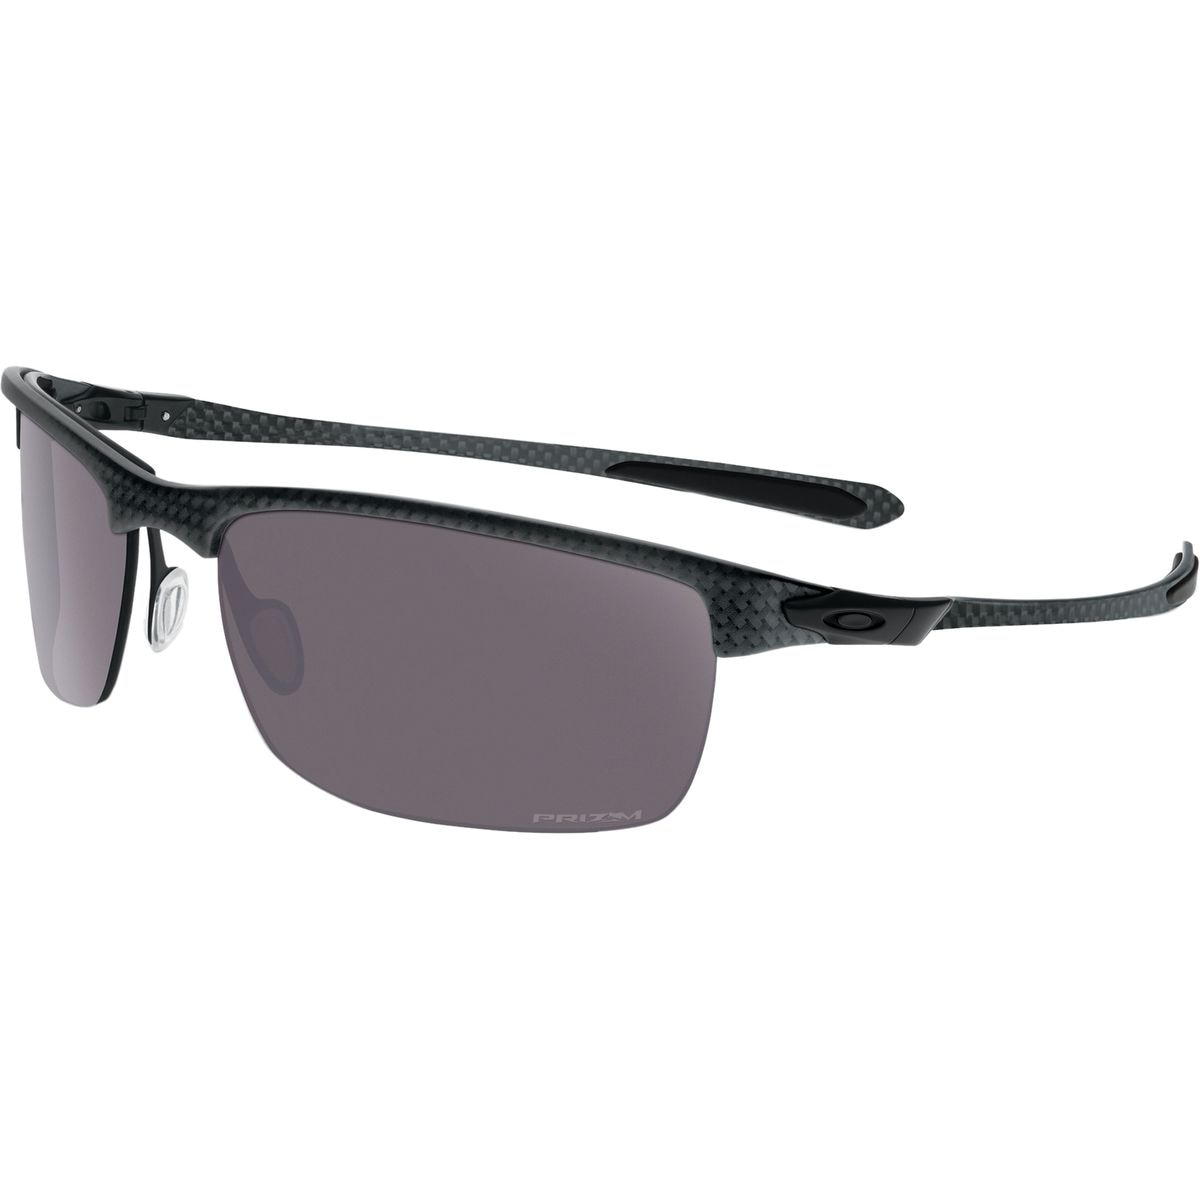 ba7160f3f38 Oakley Carbon Blade Prizm Sunglasses - Polarized